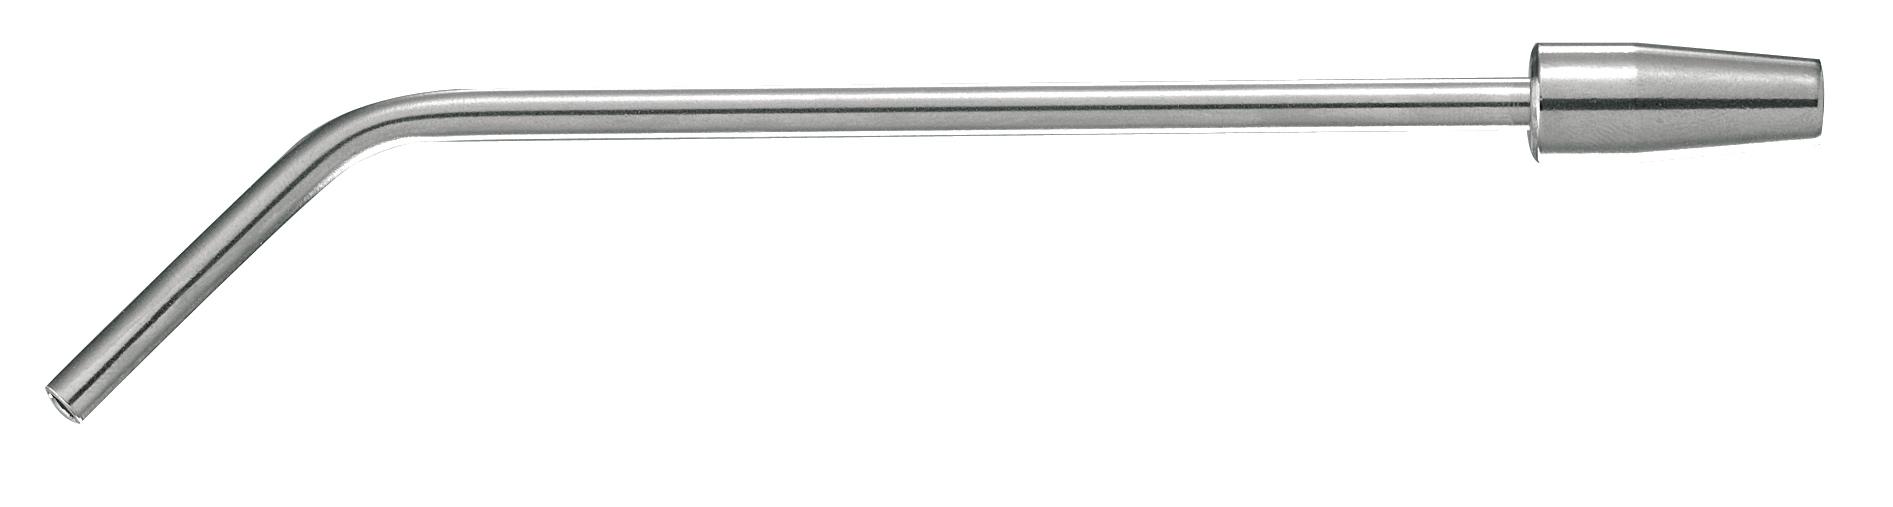 aspirator-tip-13-013-31013-miltex.jpg